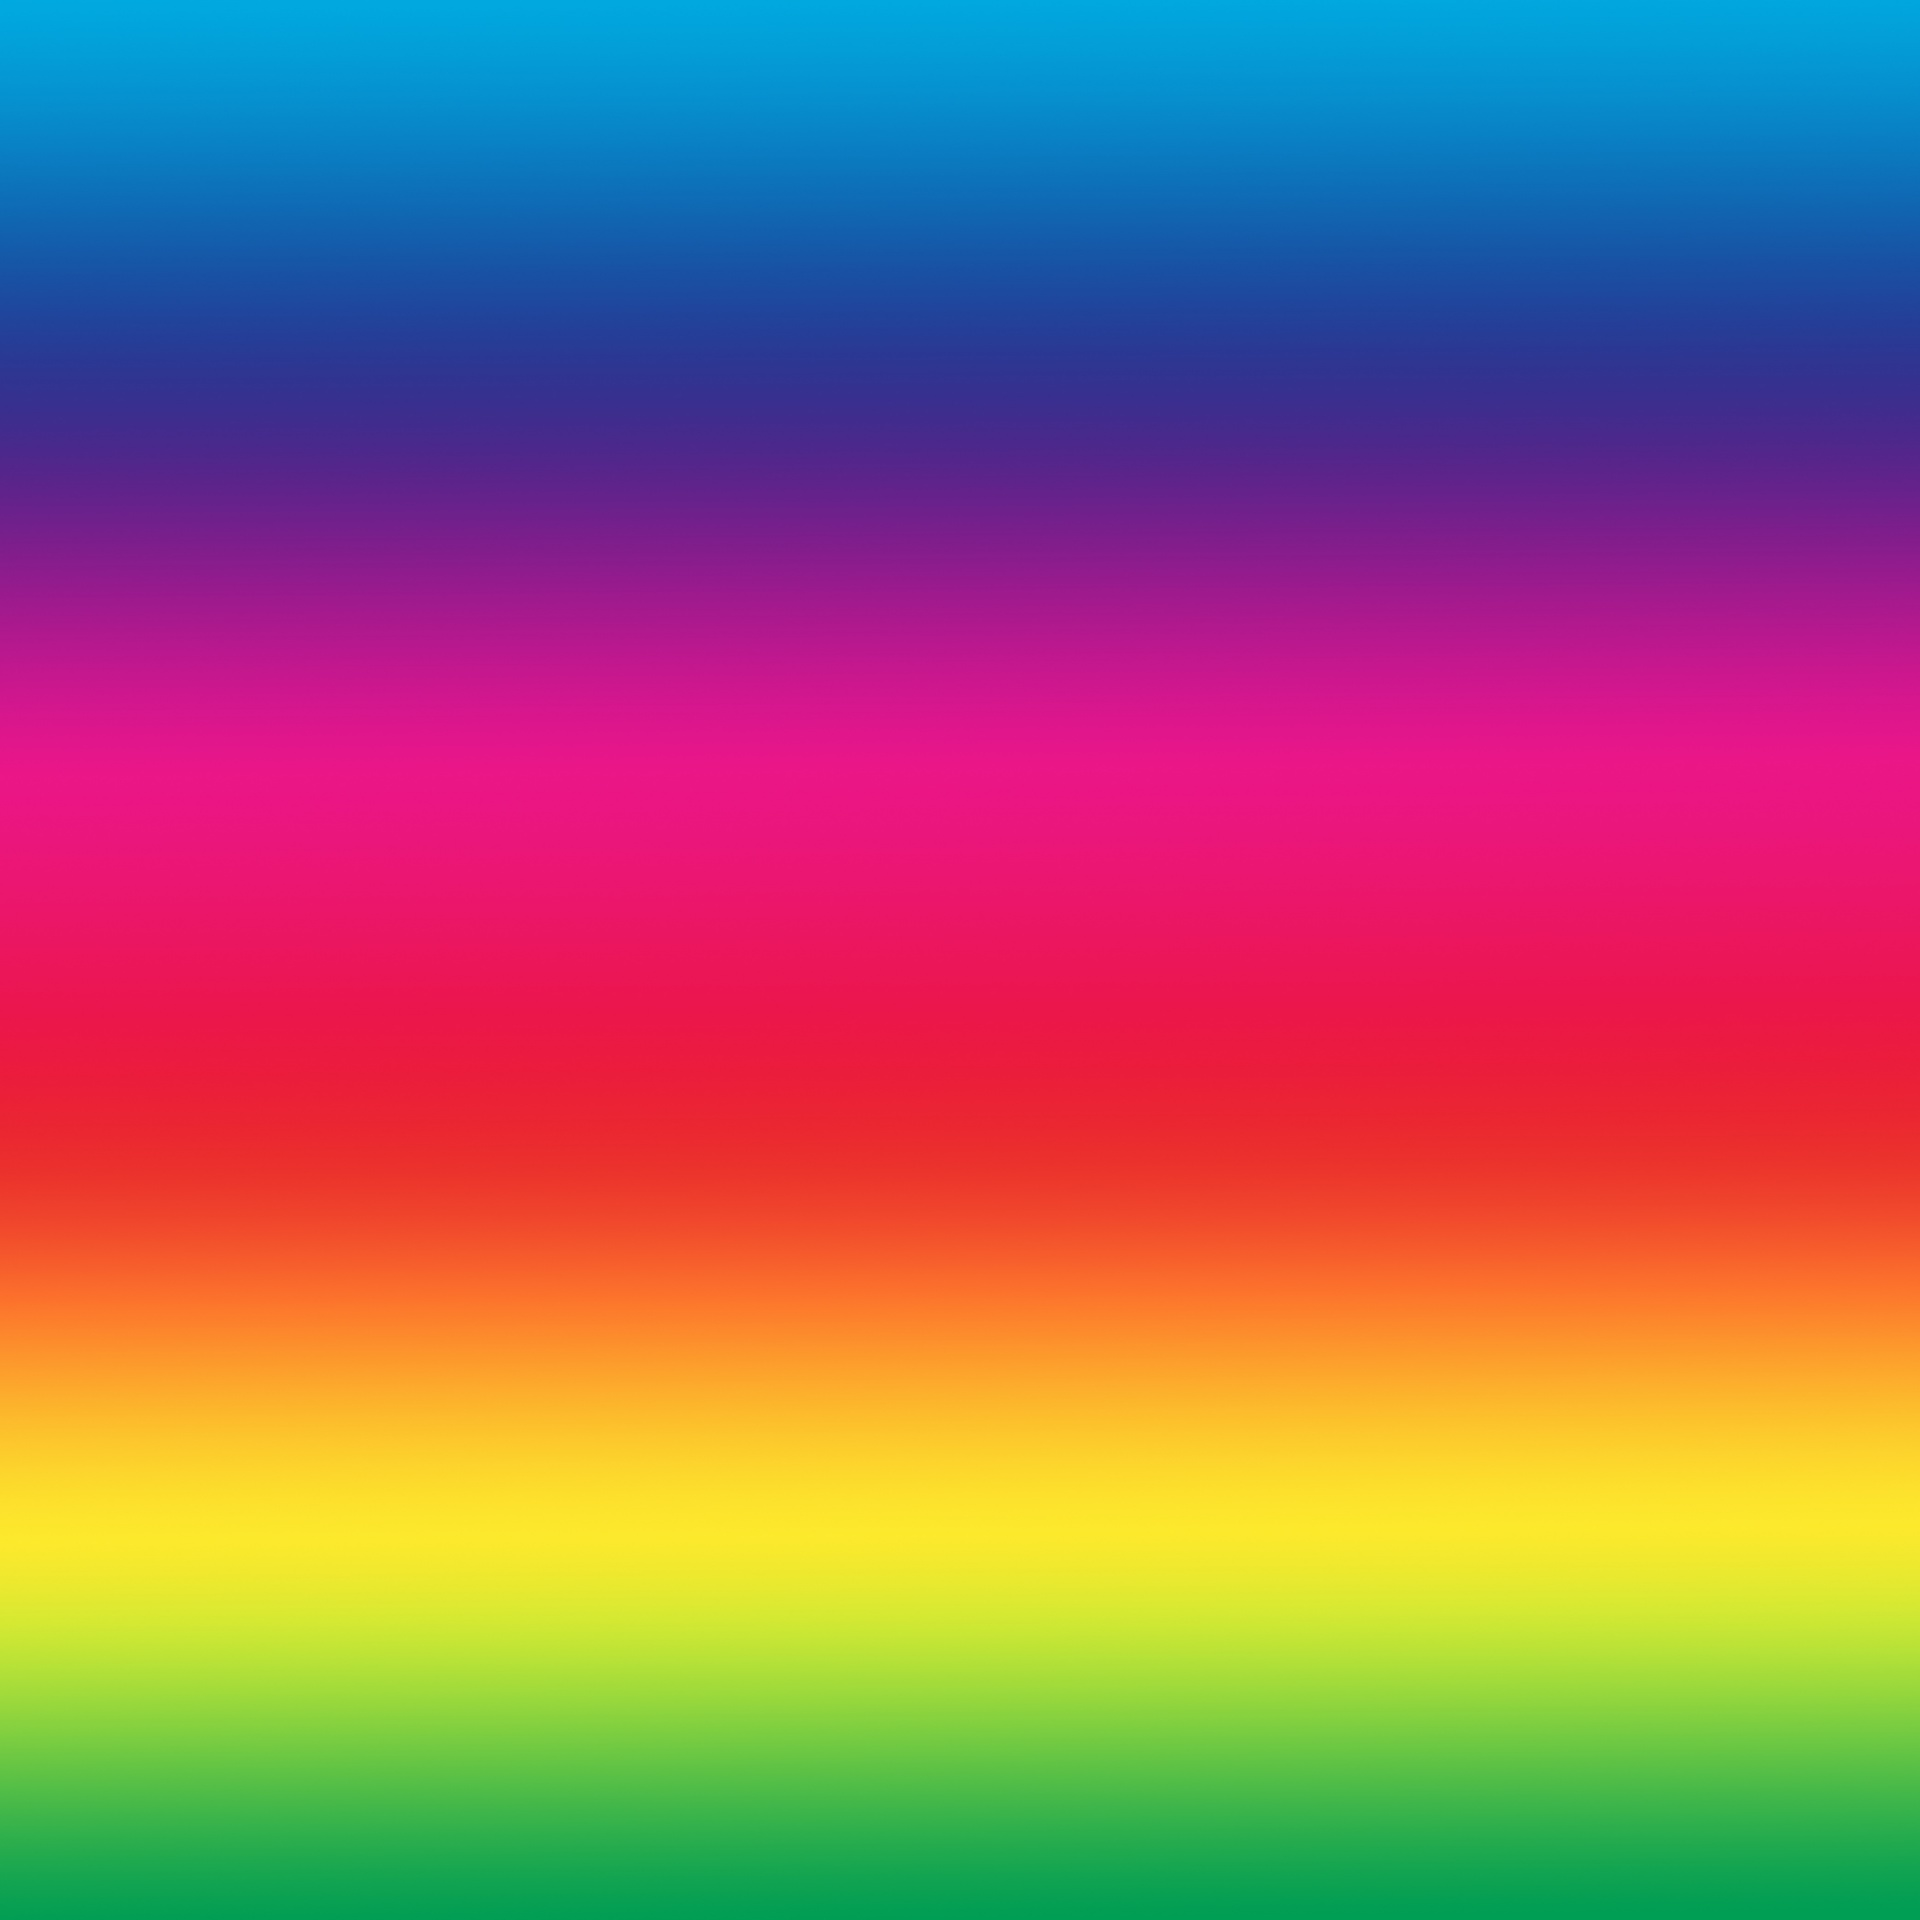 Spectrum Spectrum Colors Rainbow Background Wallpaper Free Image From Needpix Com